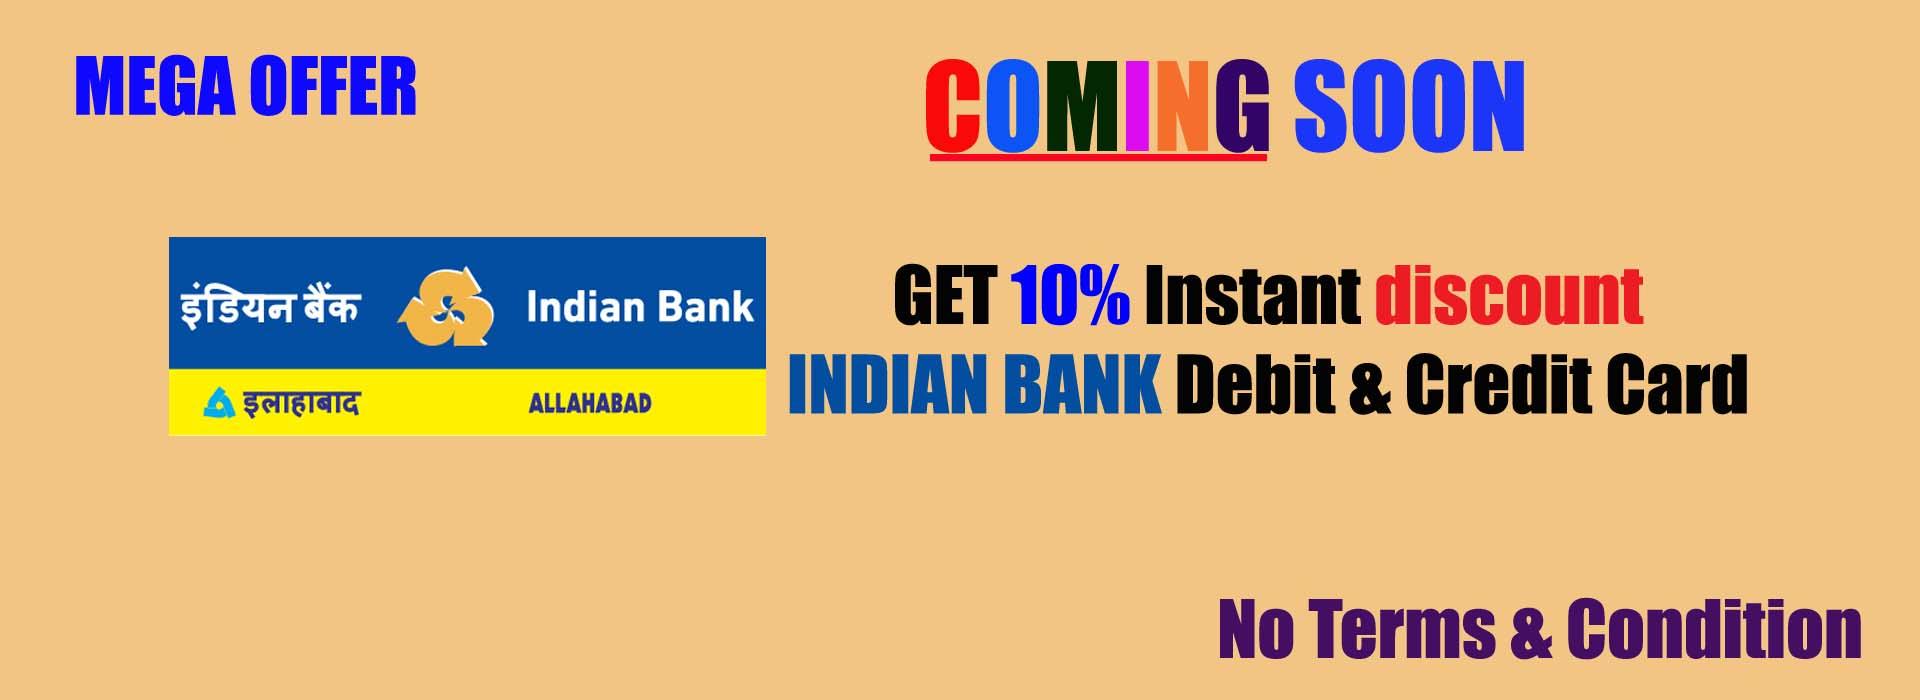 Bank Offer Banner